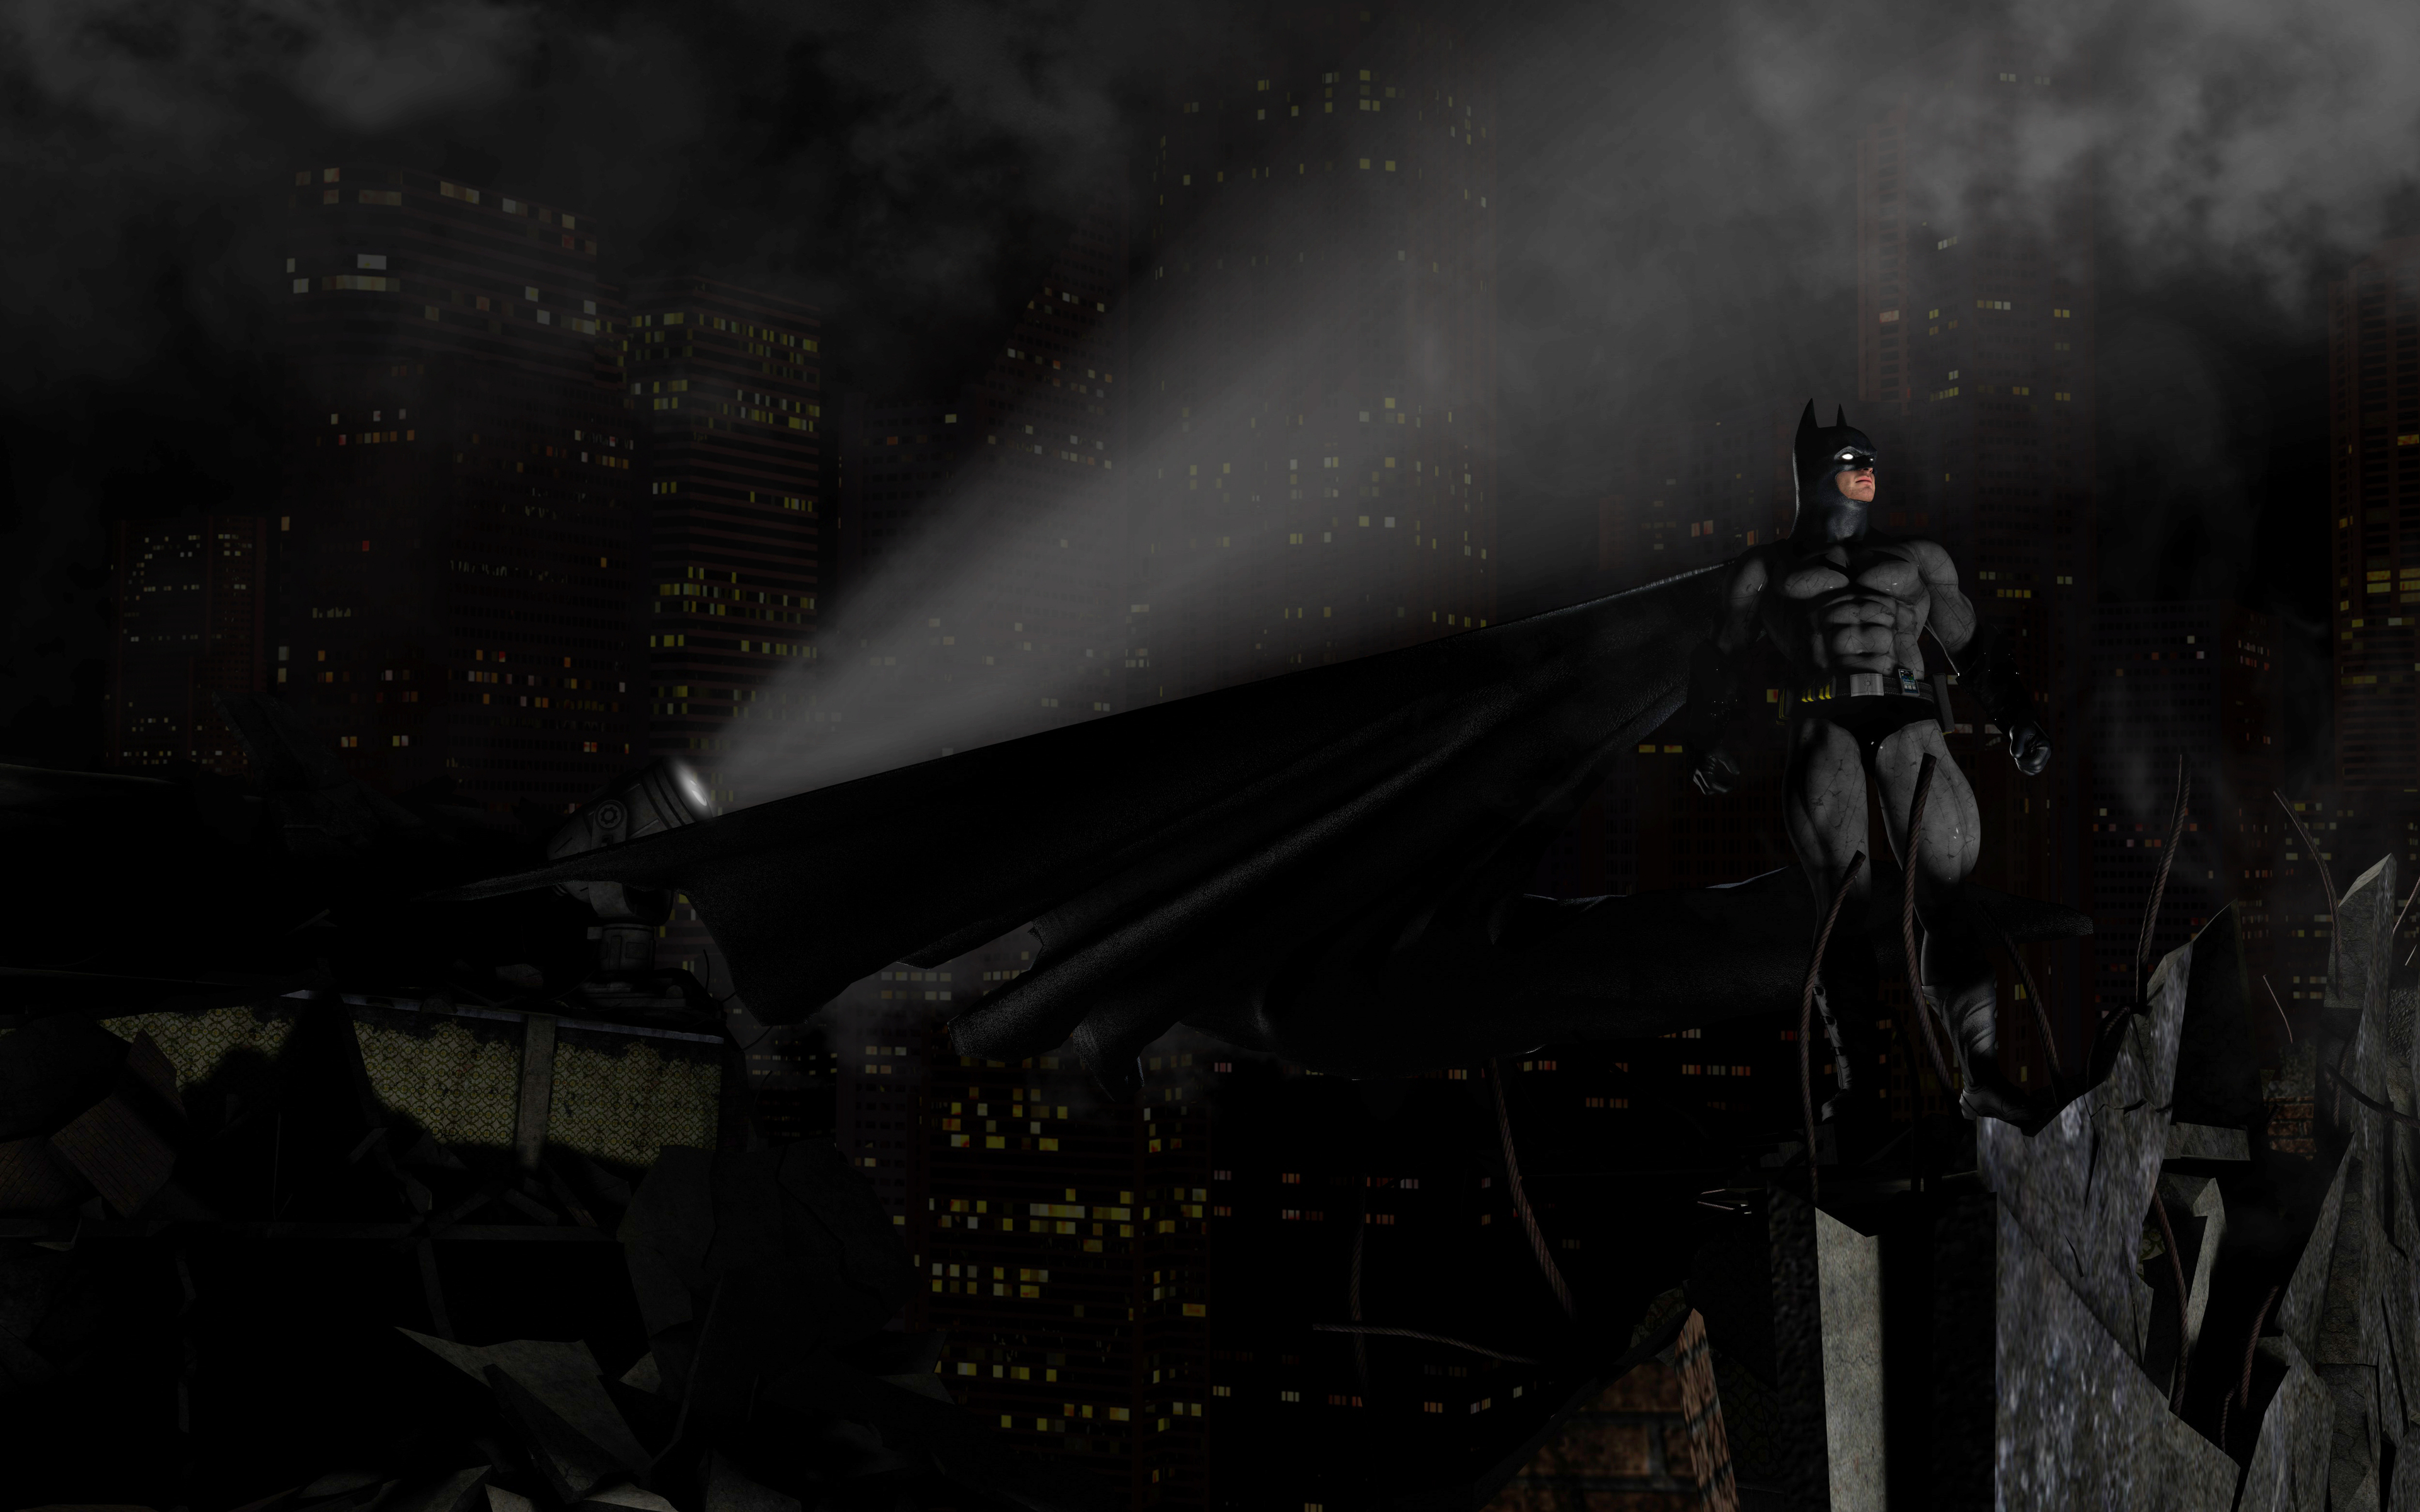 bat-of-gotham-gx.jpg